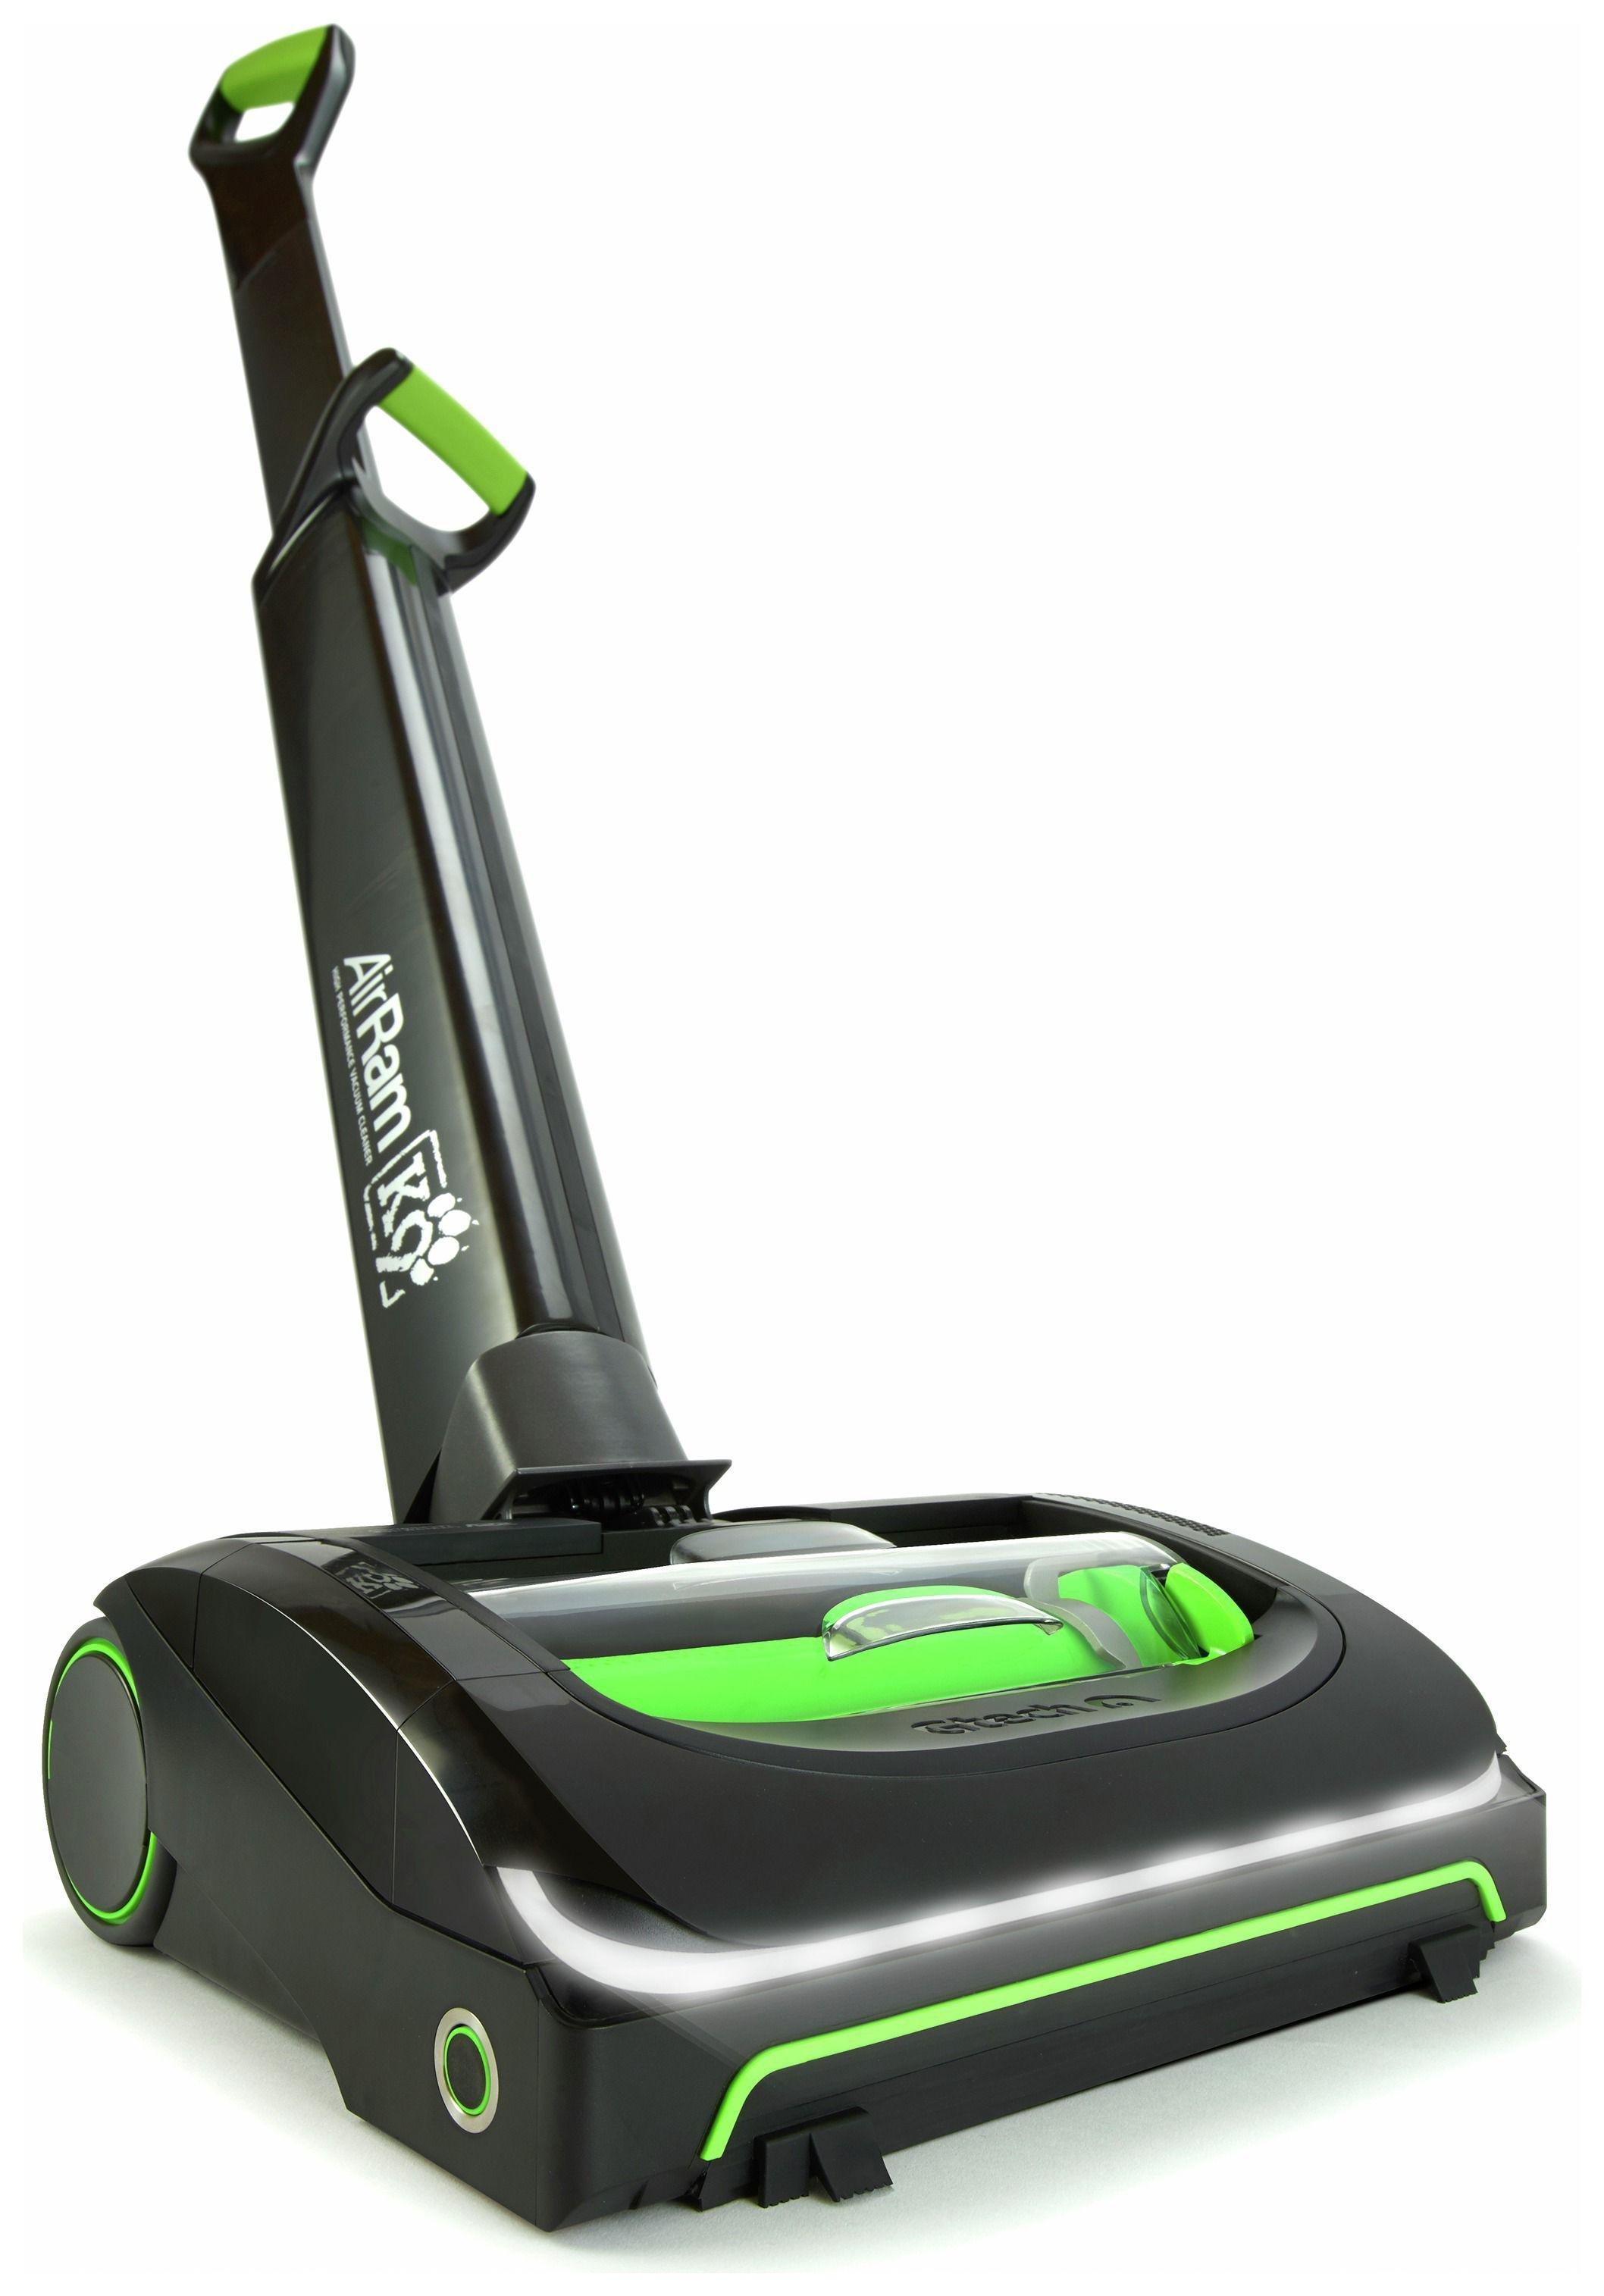 Gtech MK2 K9 AirRam Cordless Upright Vacuum Cleaner